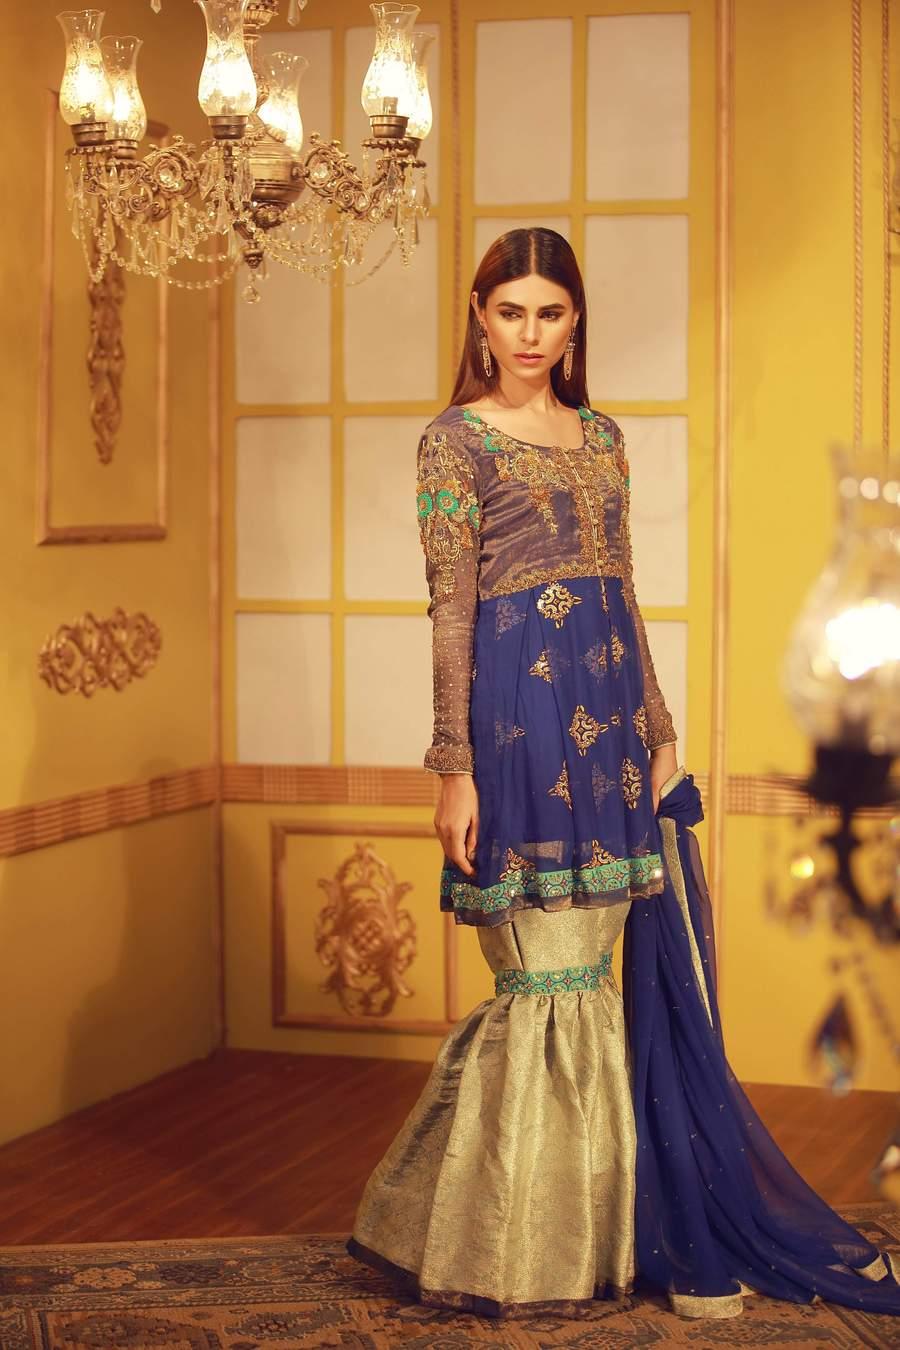 Royal Blue Zardozi Work Chiffon Peplum Mehndi Dress by Sarosh Salman paired with Jamawar Gharara Pants in Mint Color and Pure Chiffon Dupatta